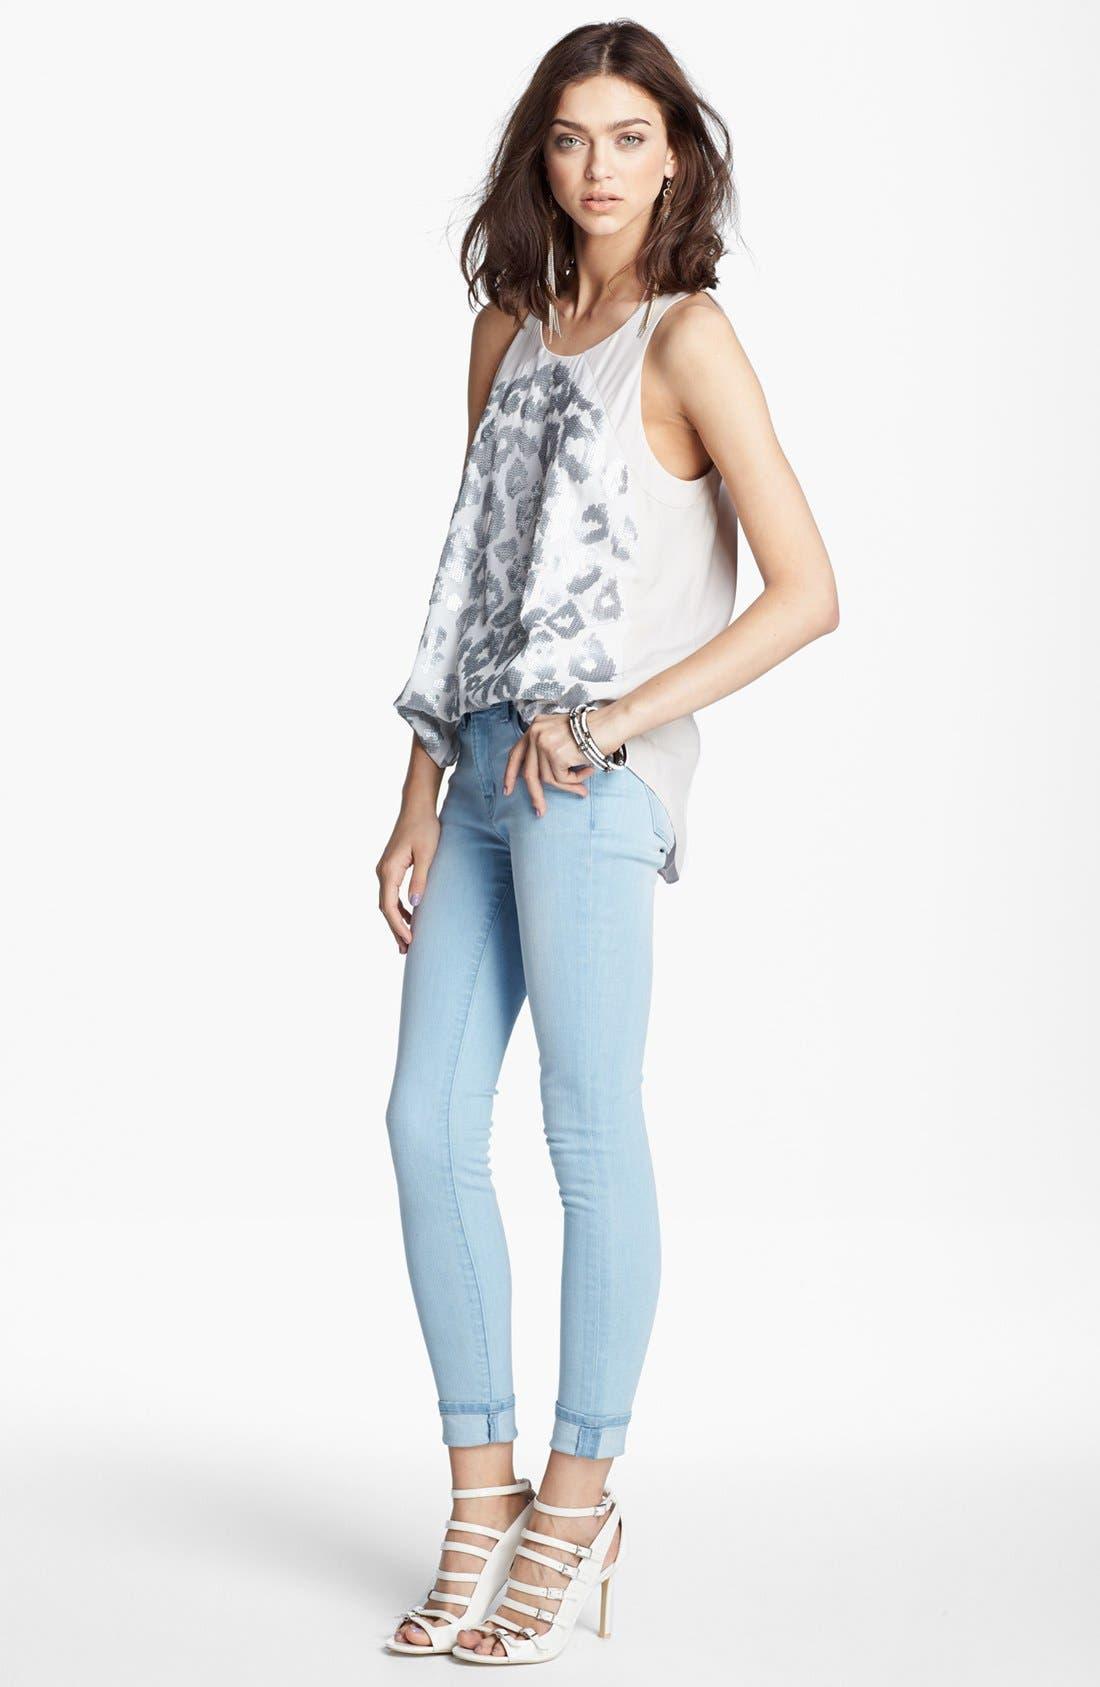 Main Image - Rebecca Taylor Tank & J Brand Jeans